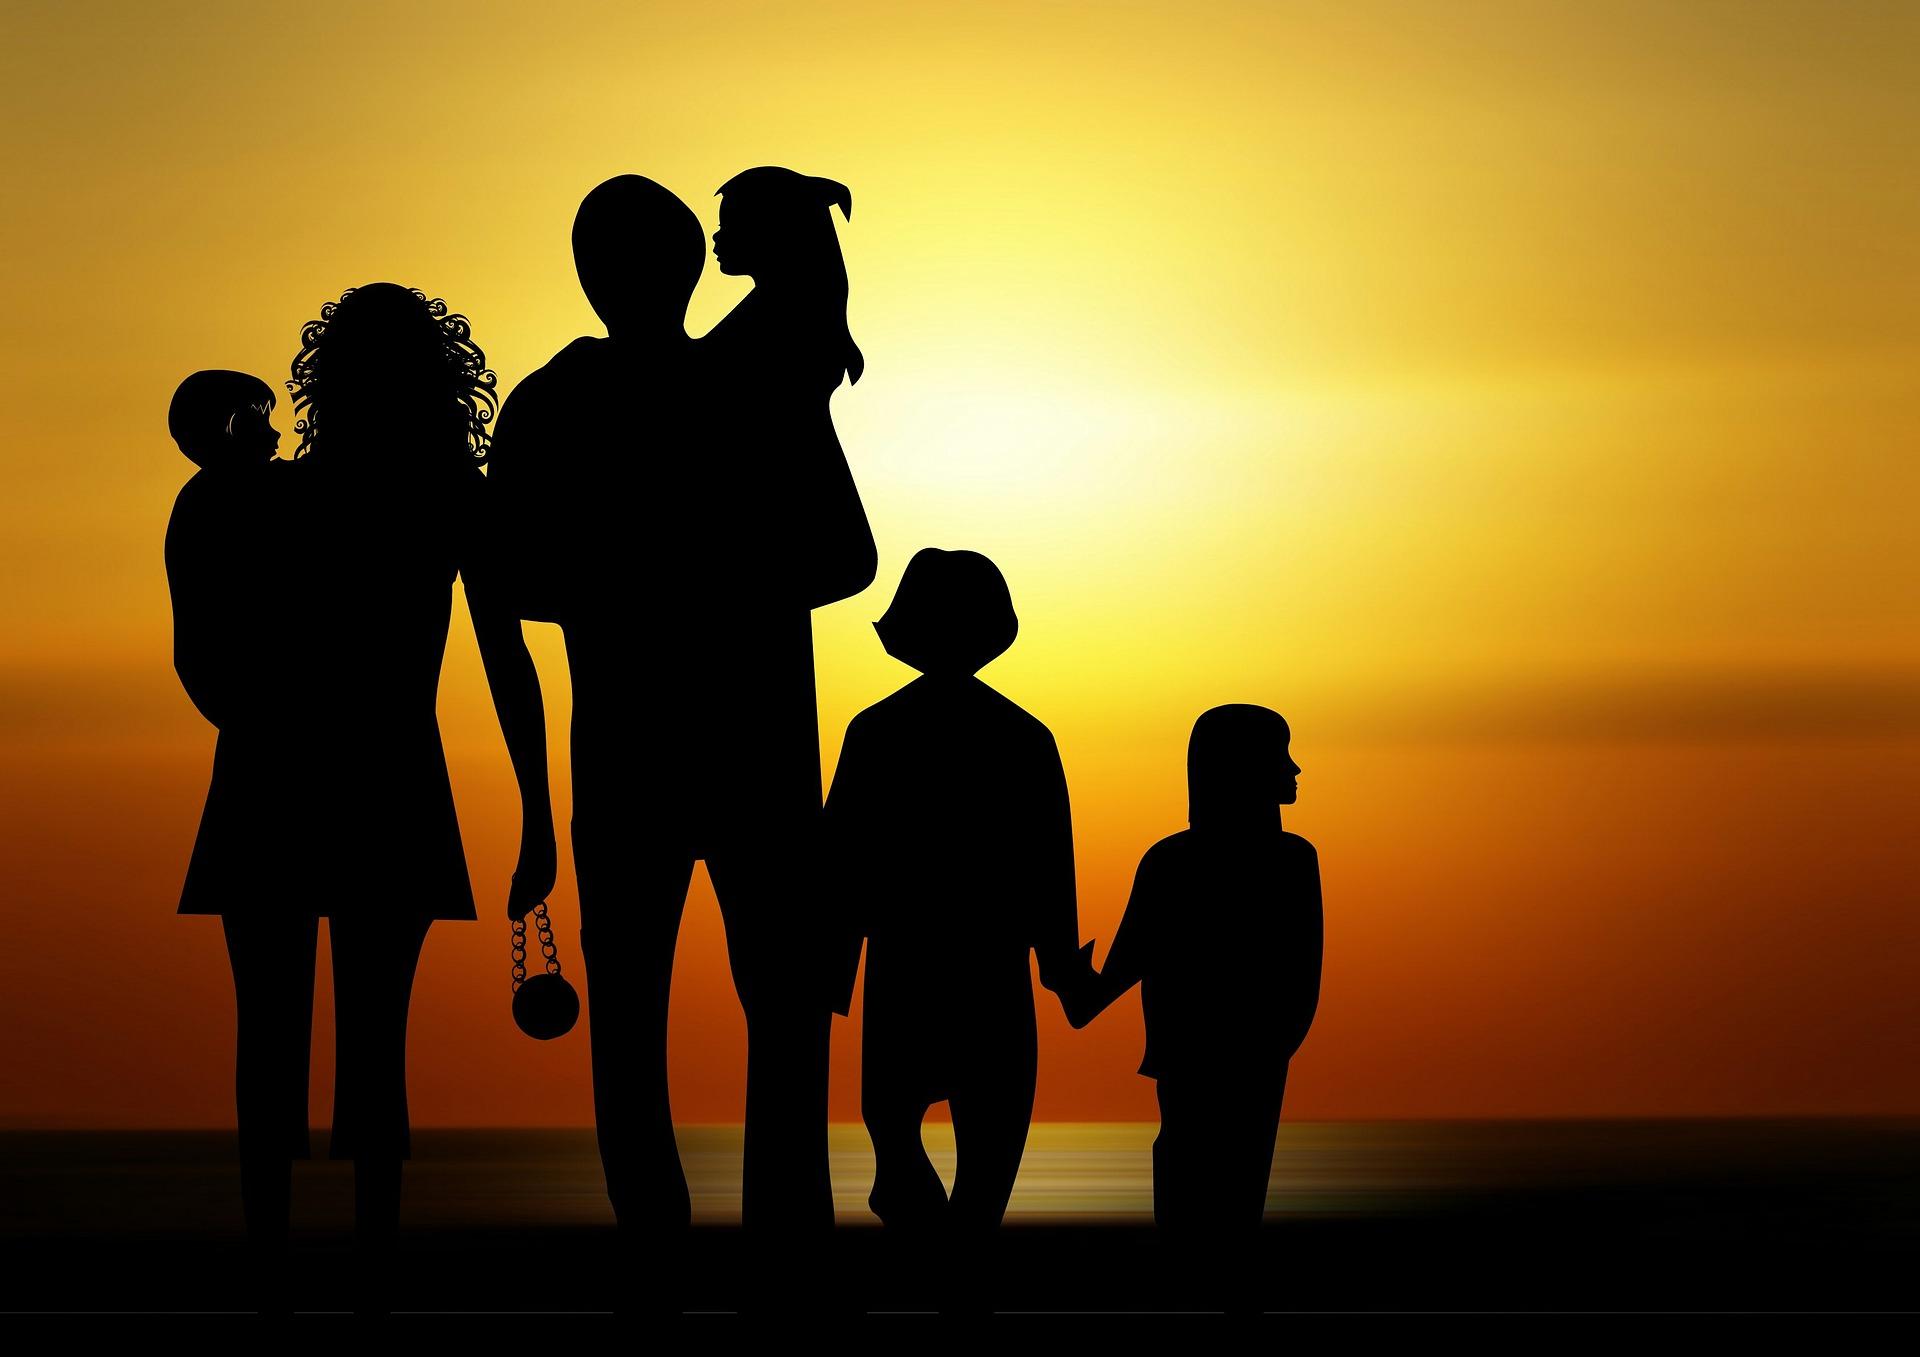 Samengesteld gezin